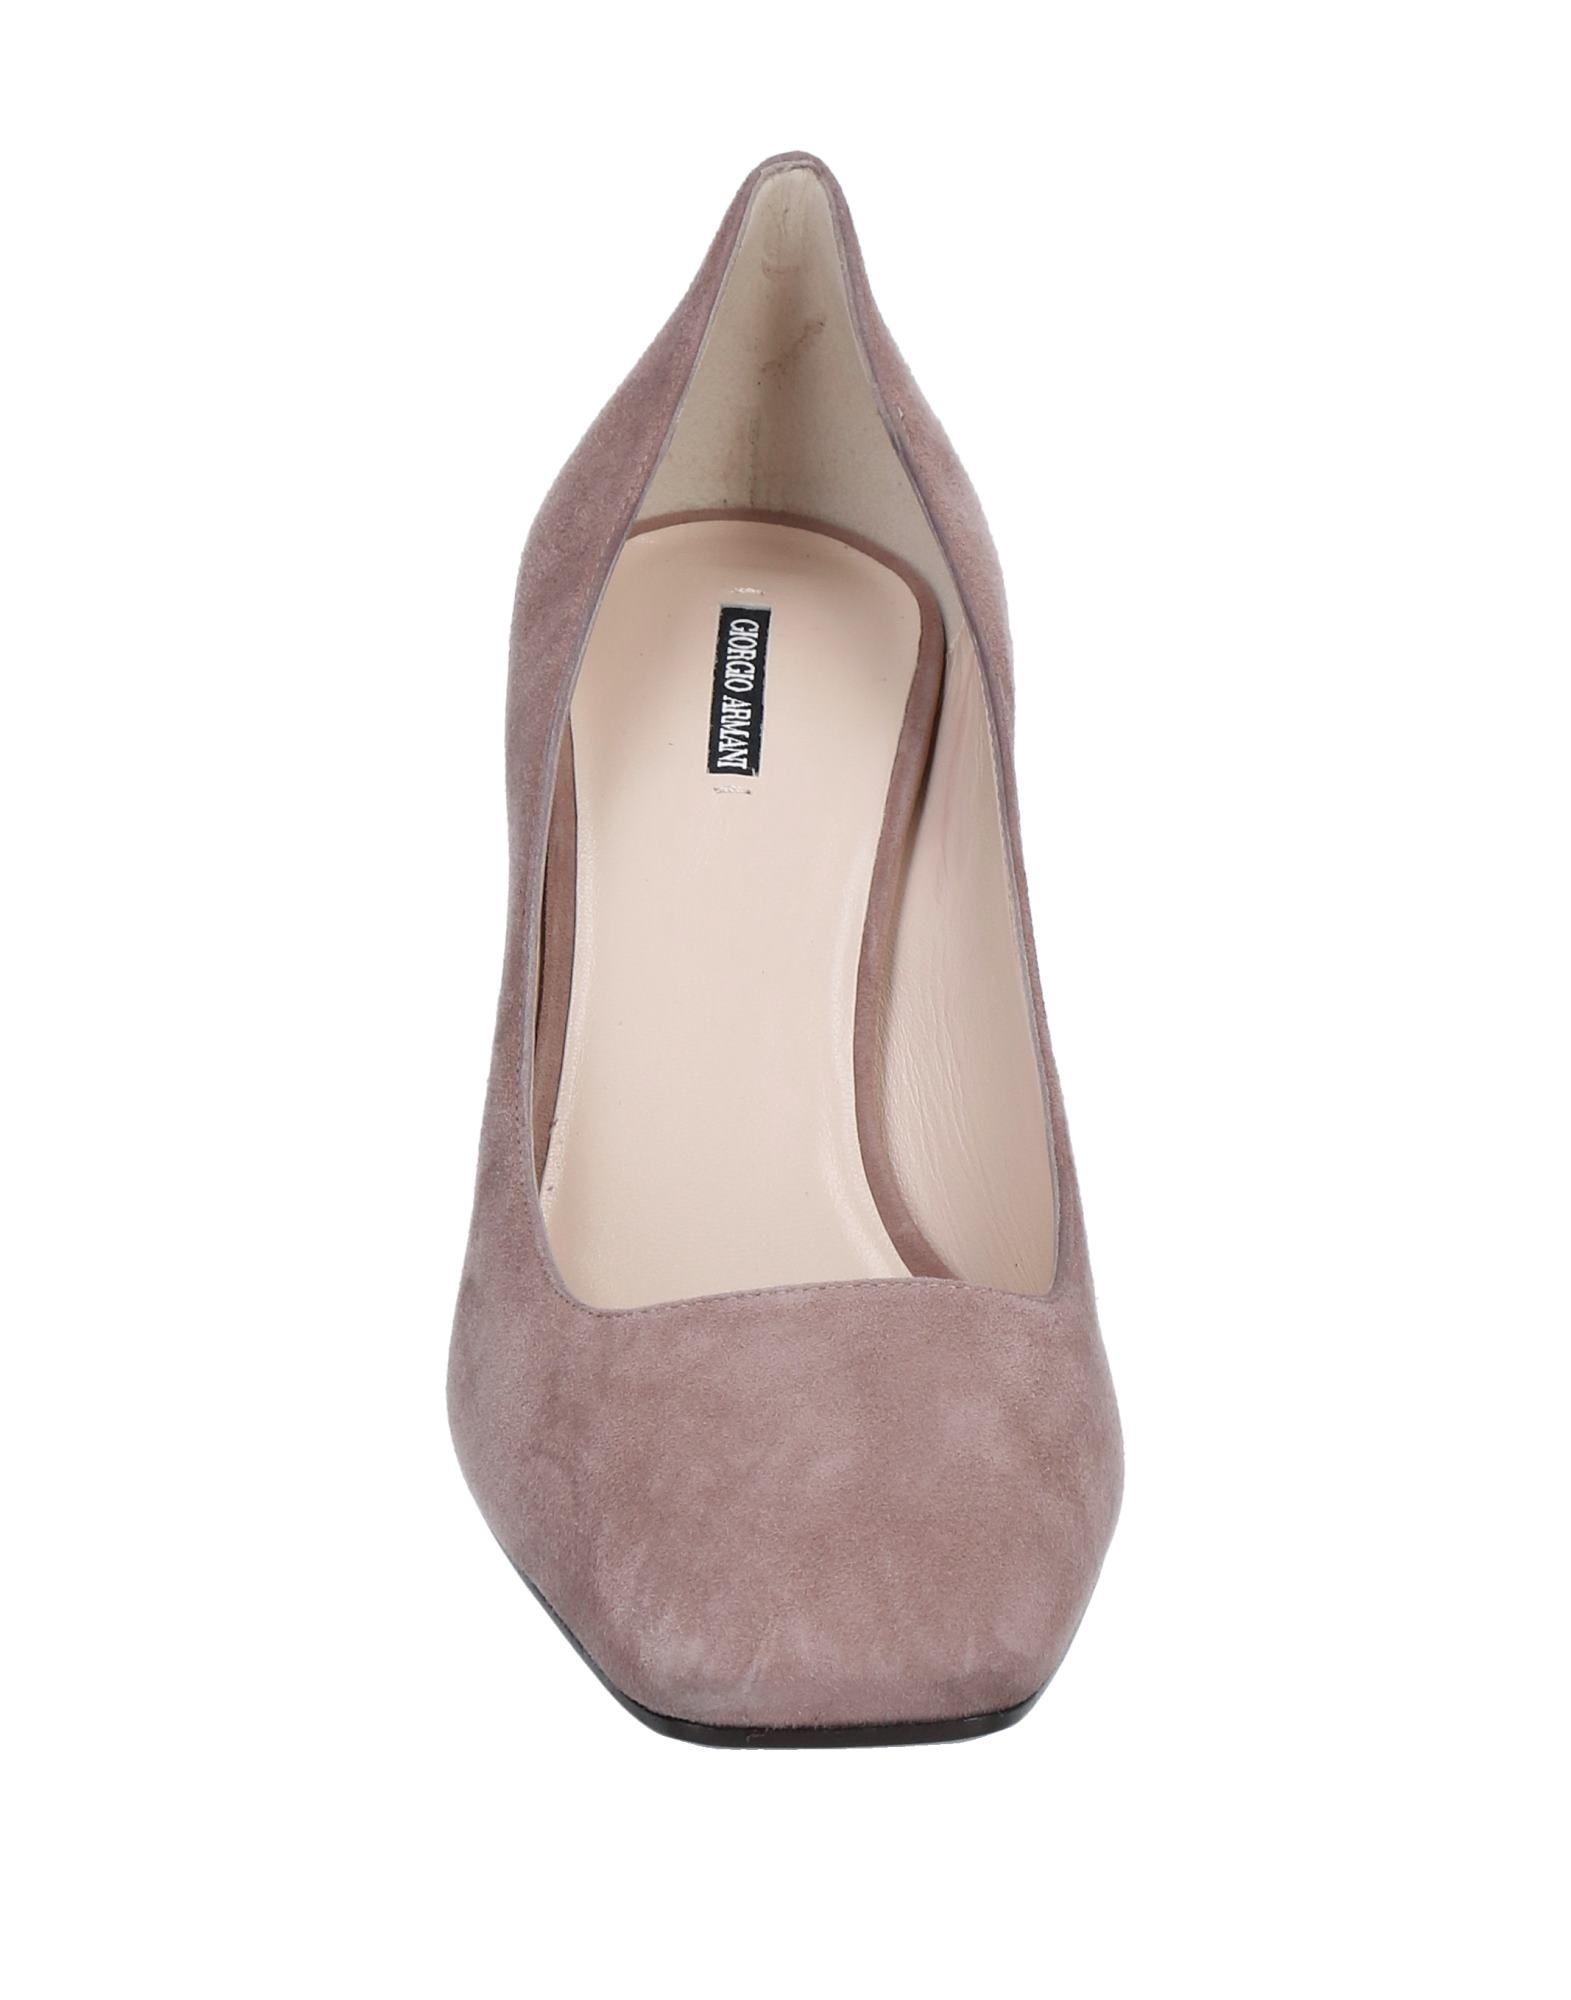 Rabatt Schuhe  Giorgio Armani Pumps Damen  Schuhe 11528601IM da1ab7